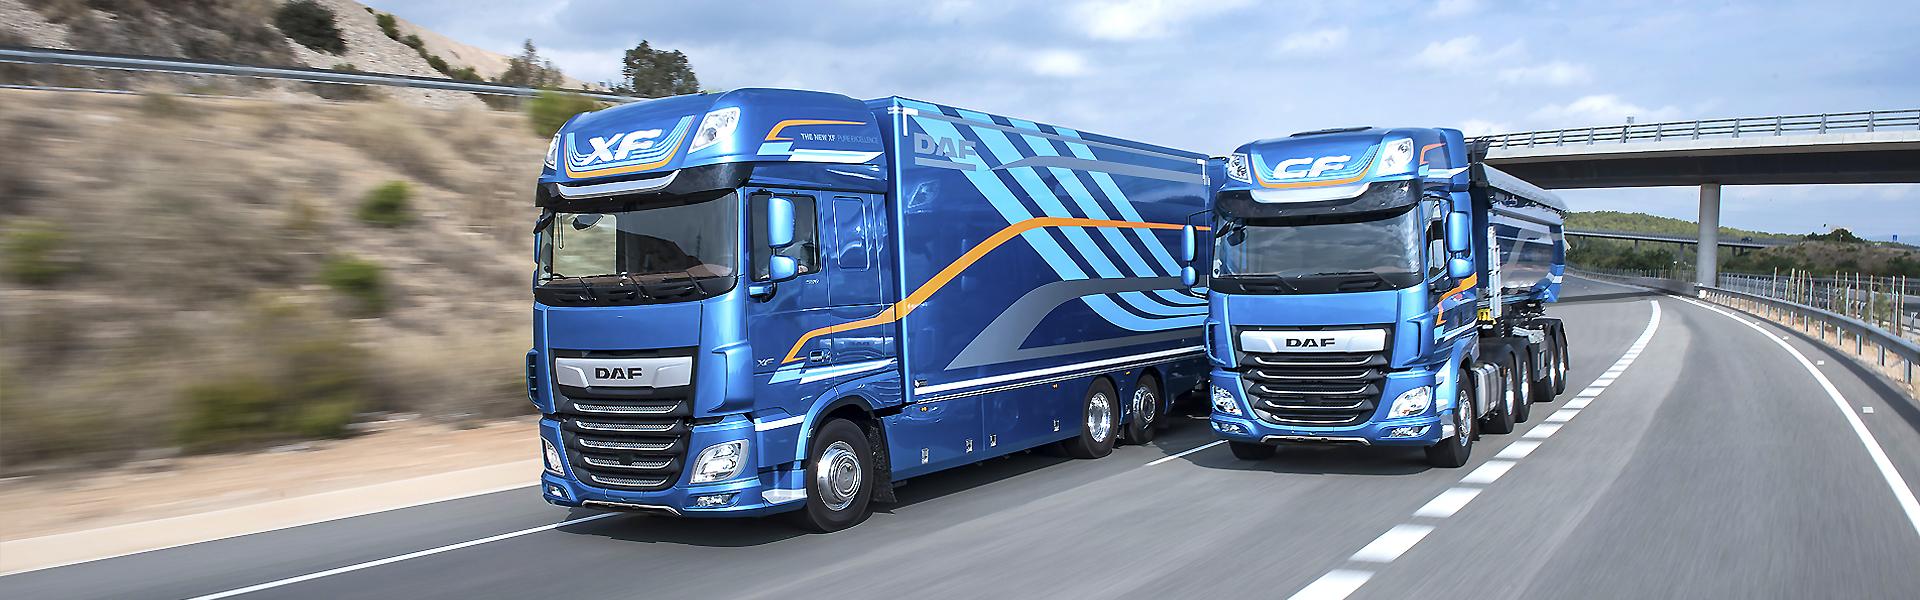 Boonstoppel Truckservice Waddinxveen - DAF Truck XF CF